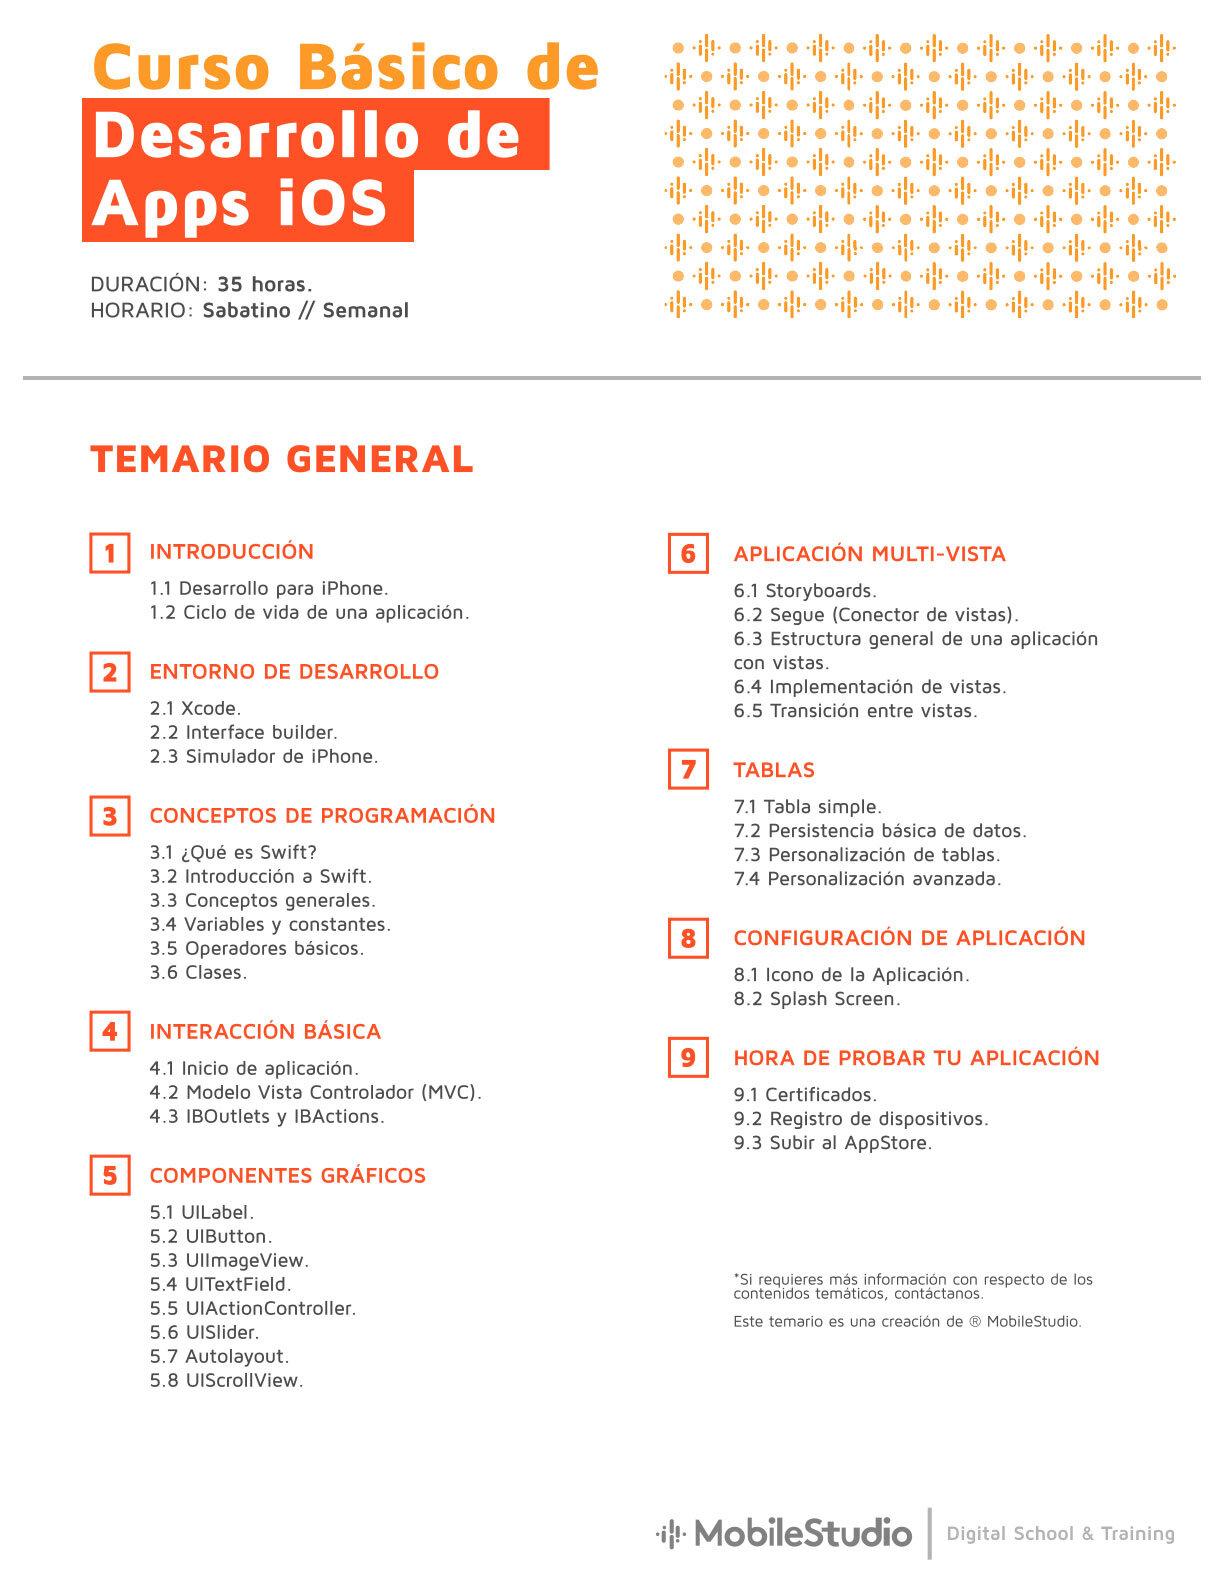 Curso de iOS básico temario